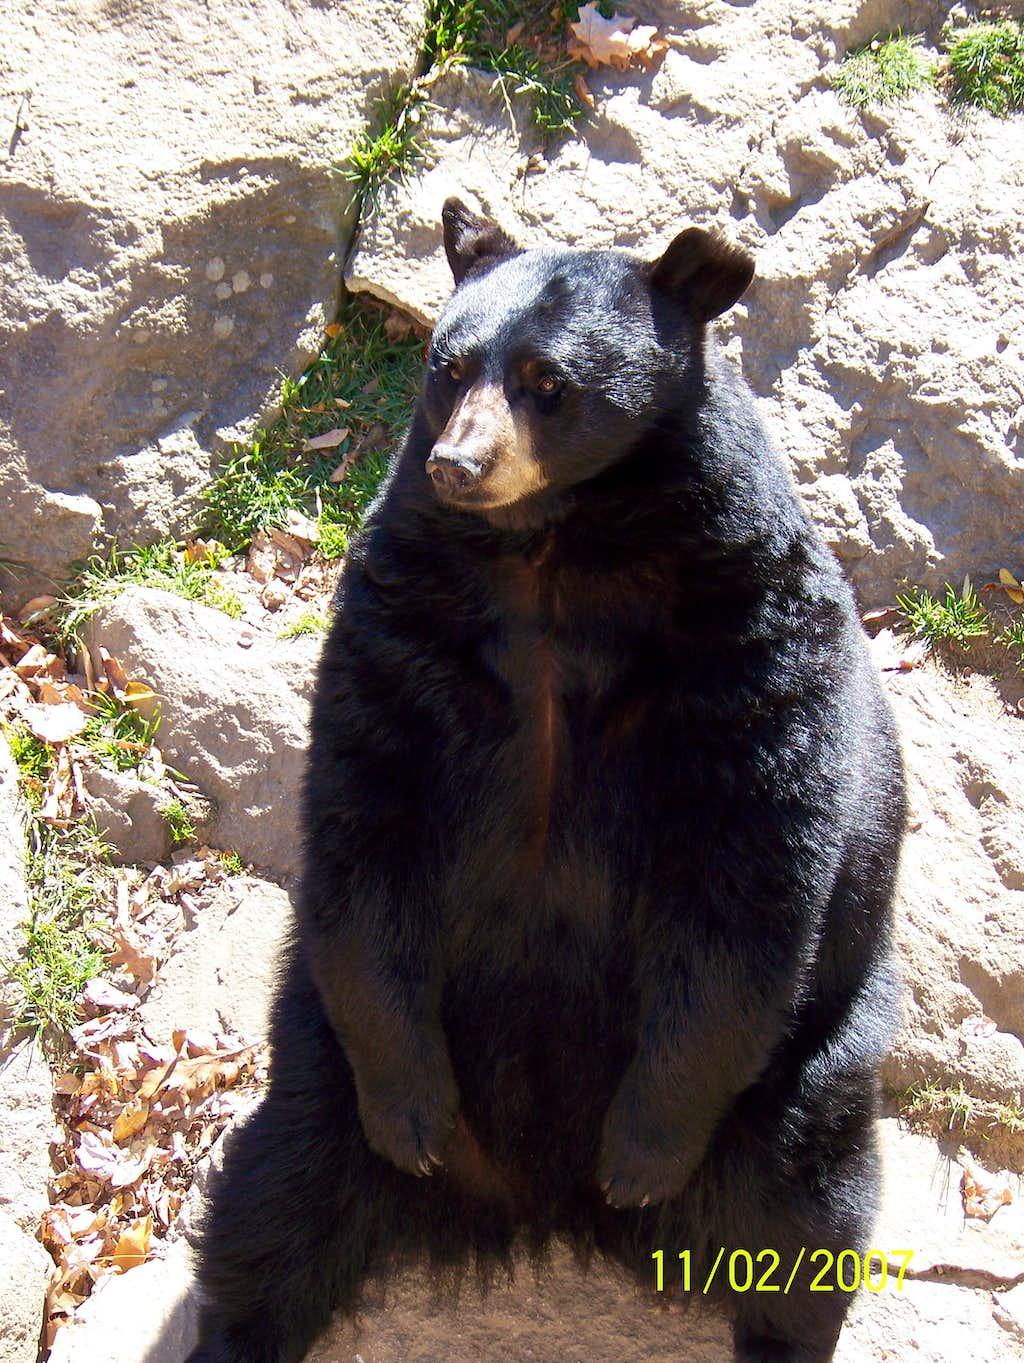 It's The Bear !!!